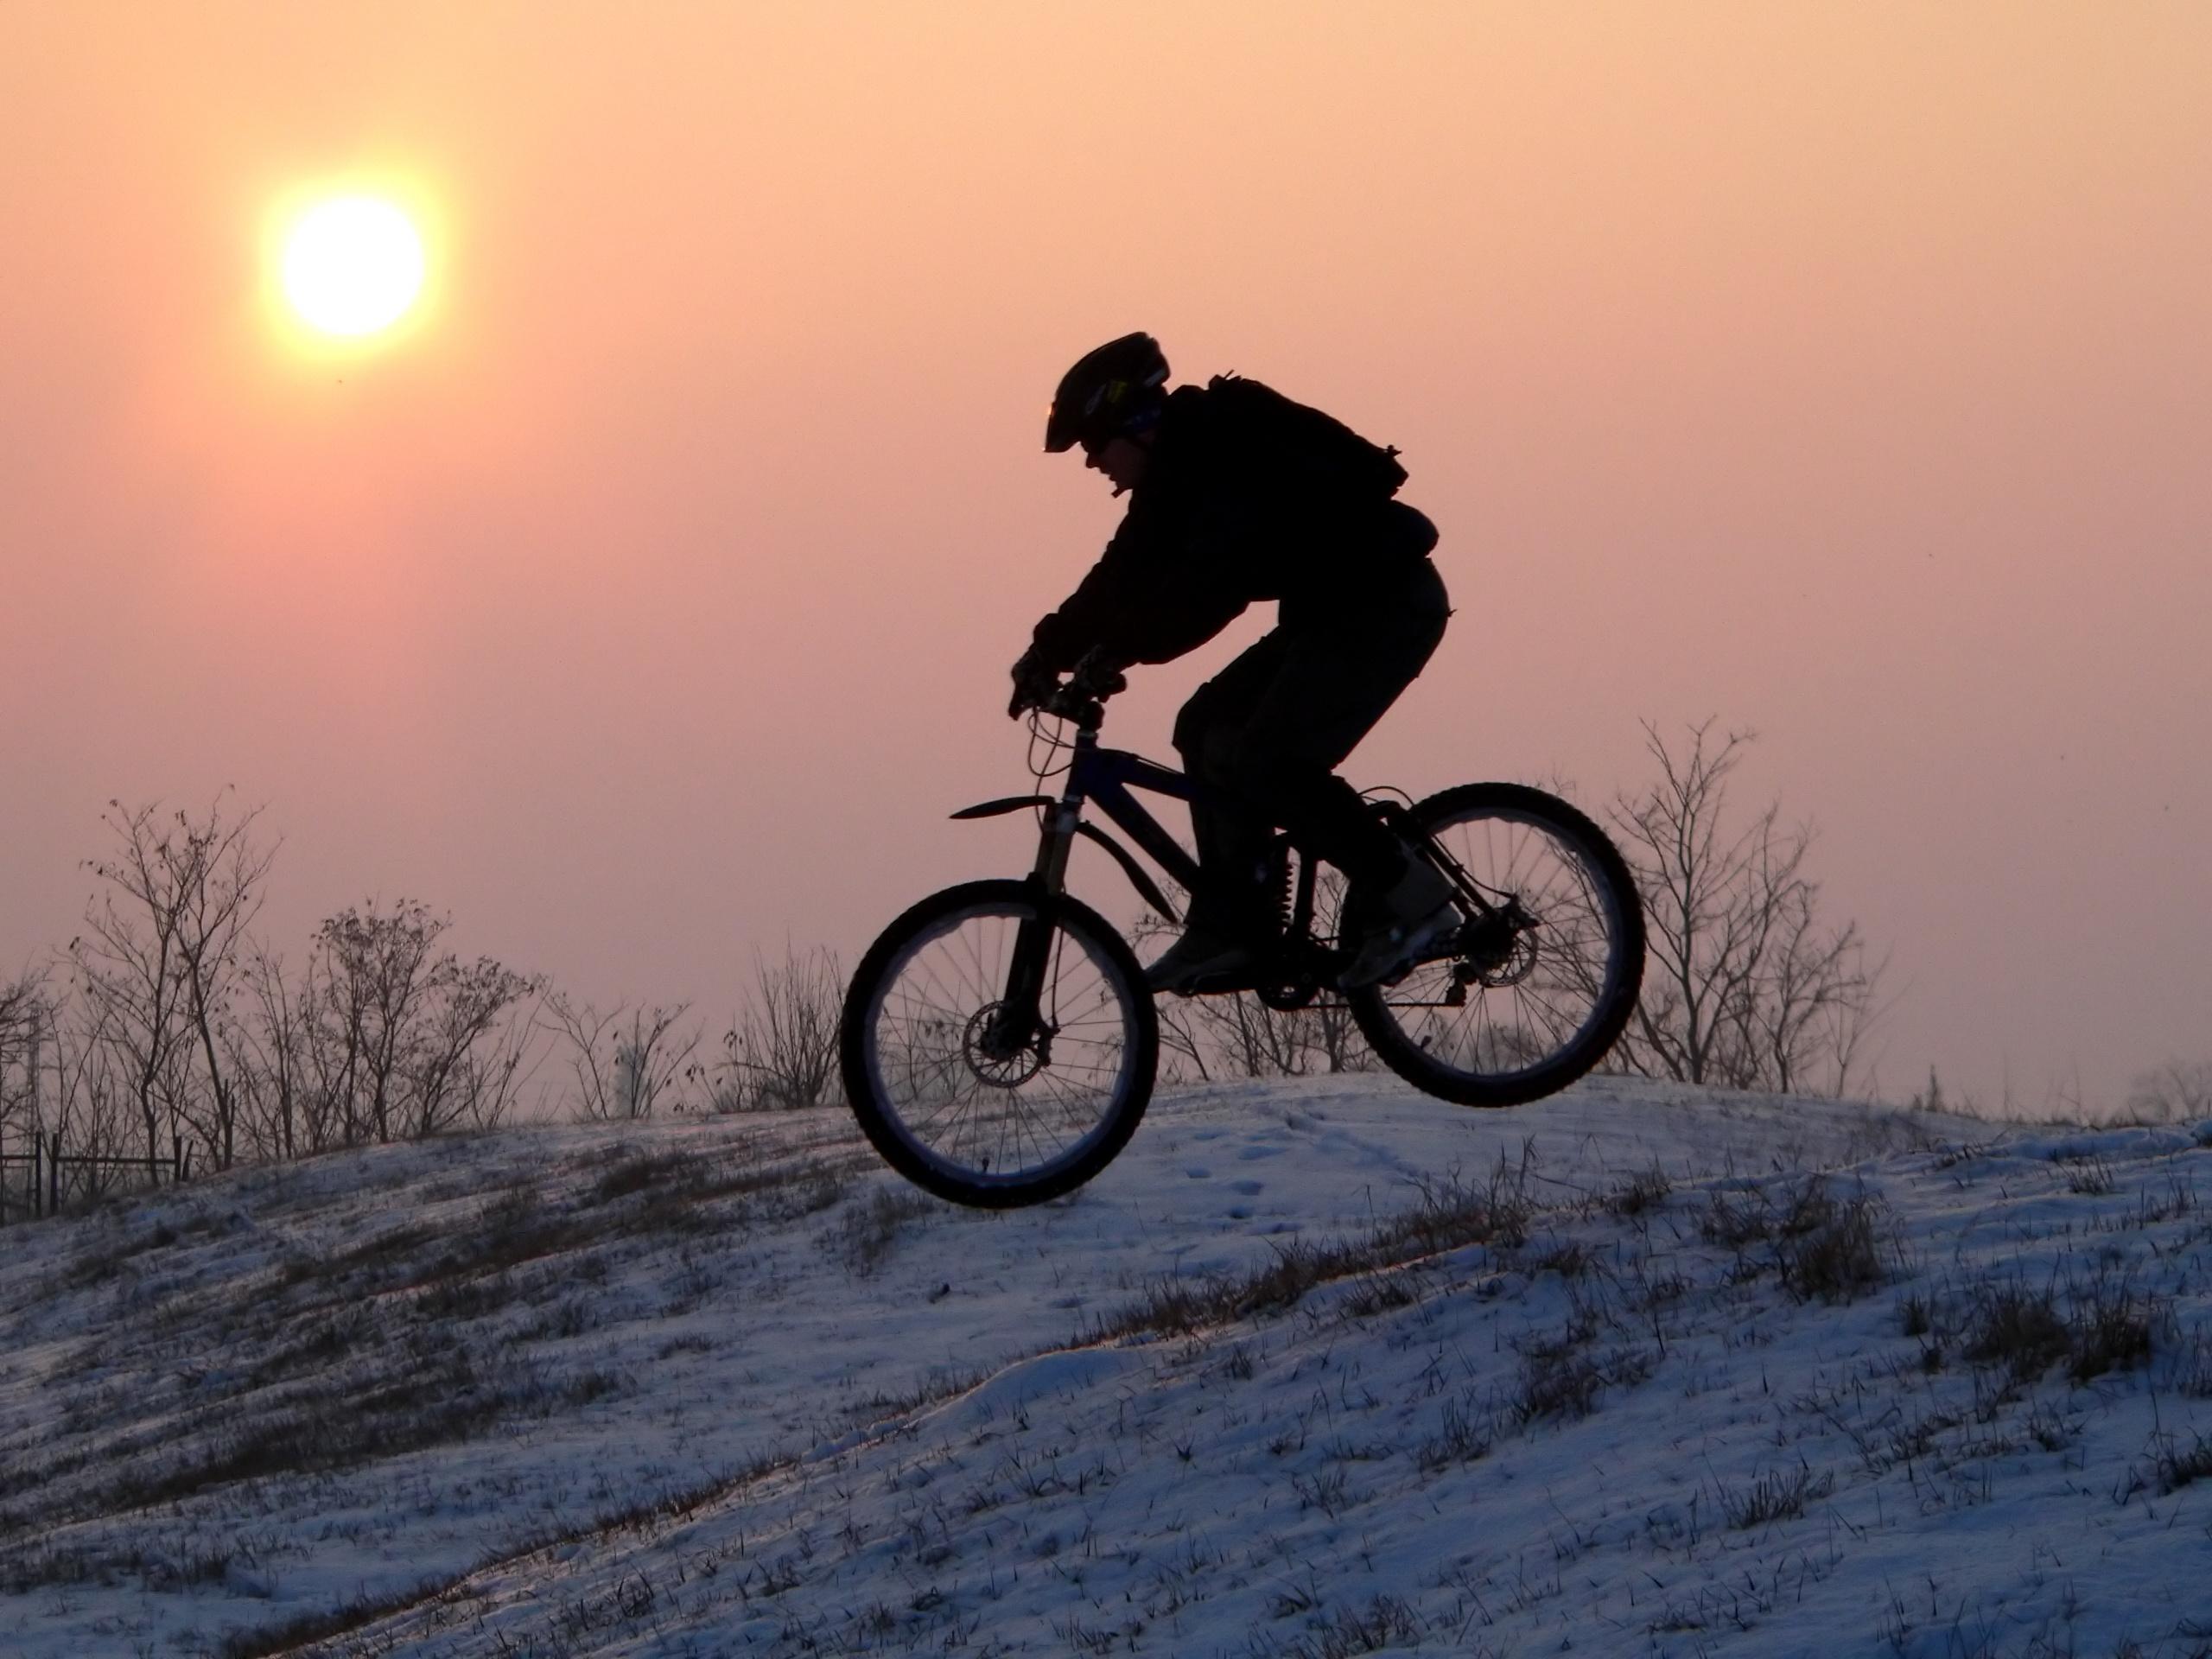 Winter Biking - Biker on snow covered hill